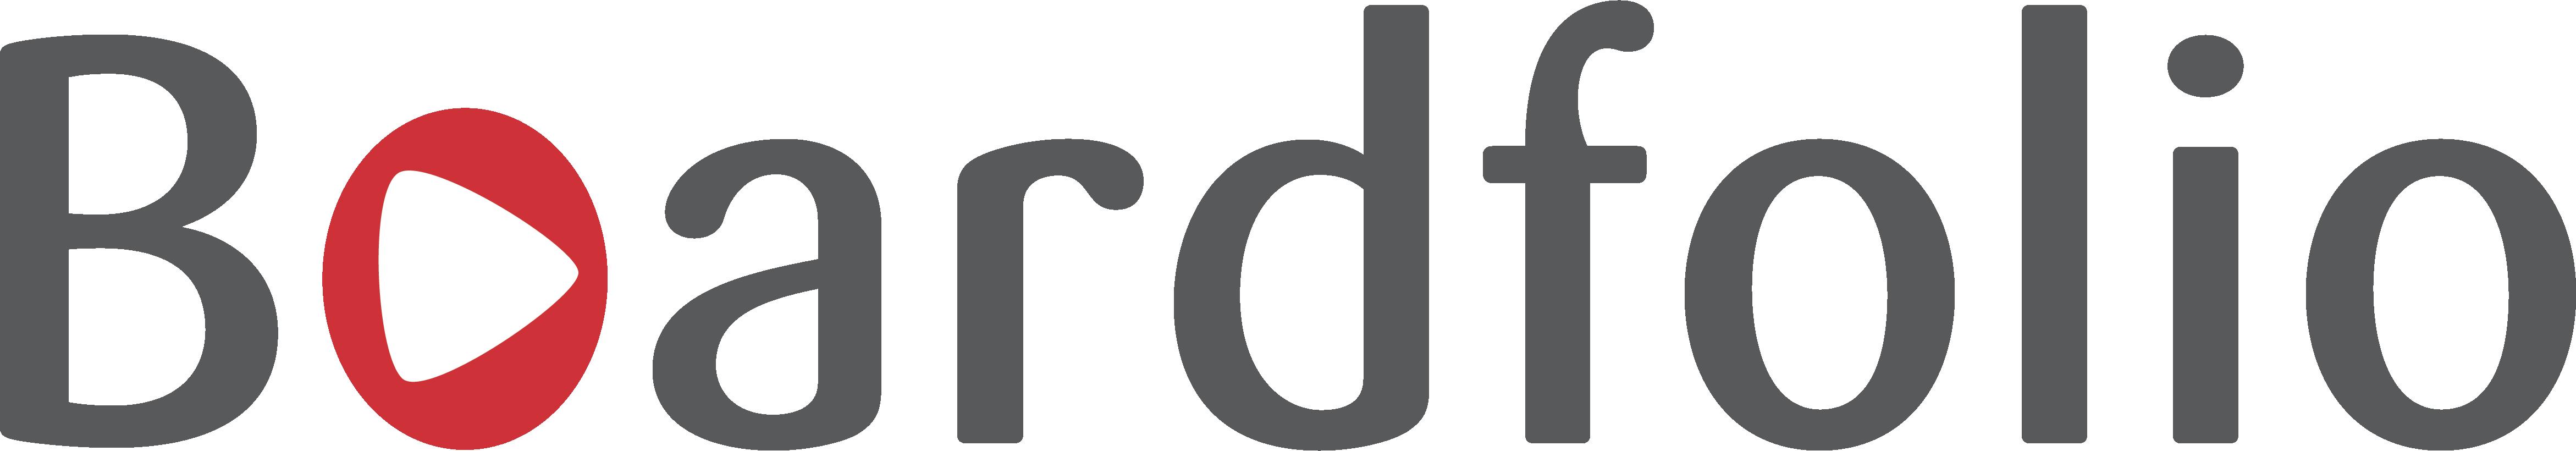 Boardfolio logo